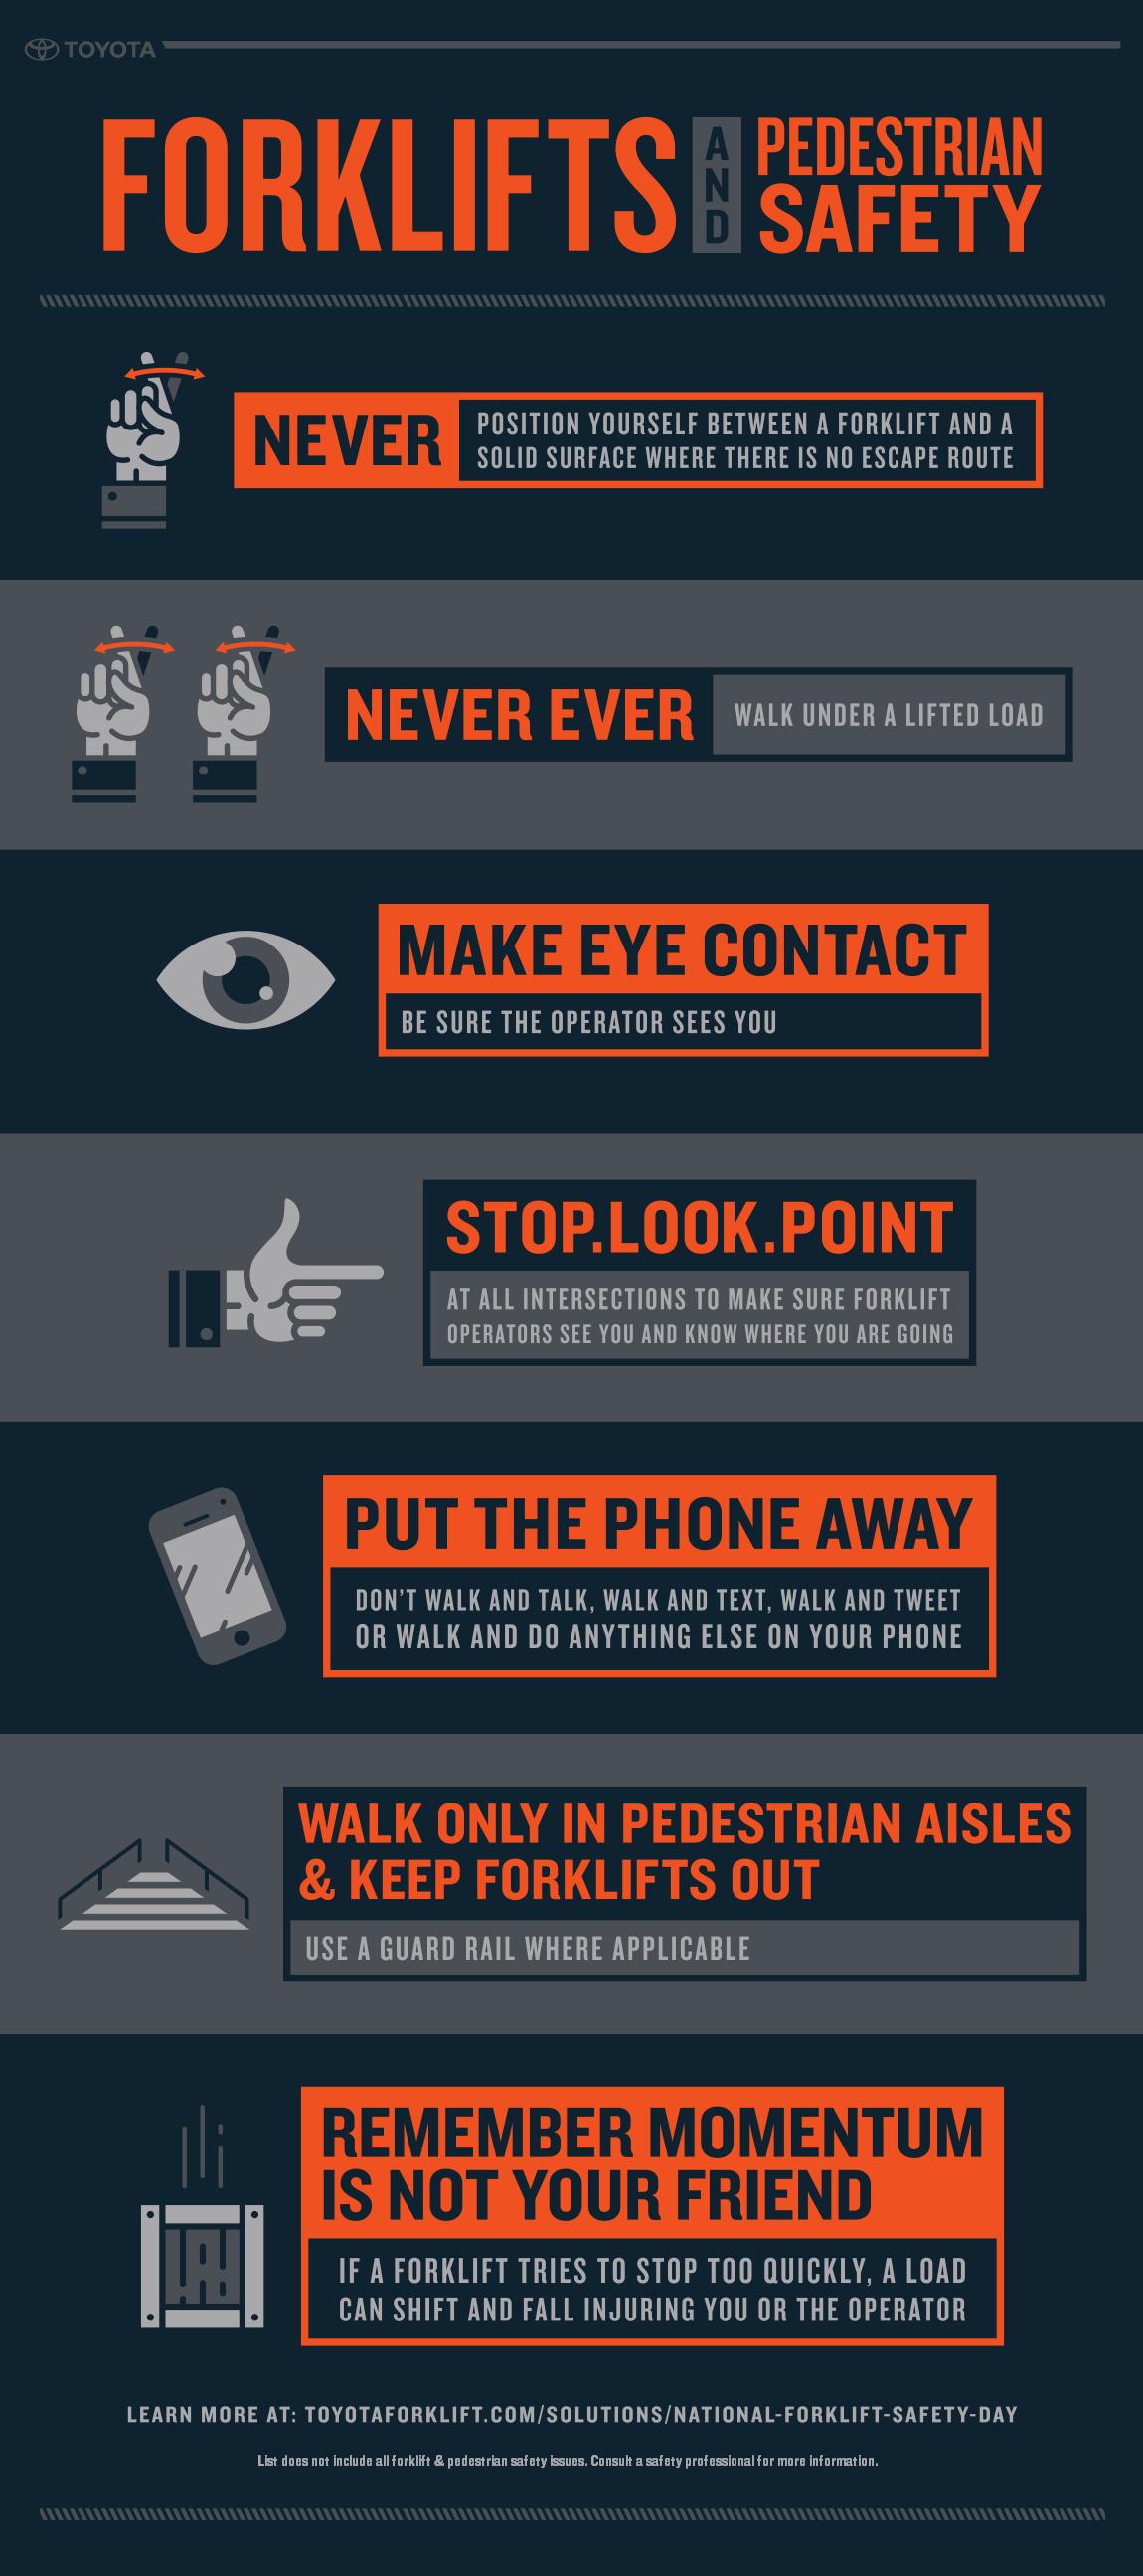 warehouse forklift pedestrian safety infographic